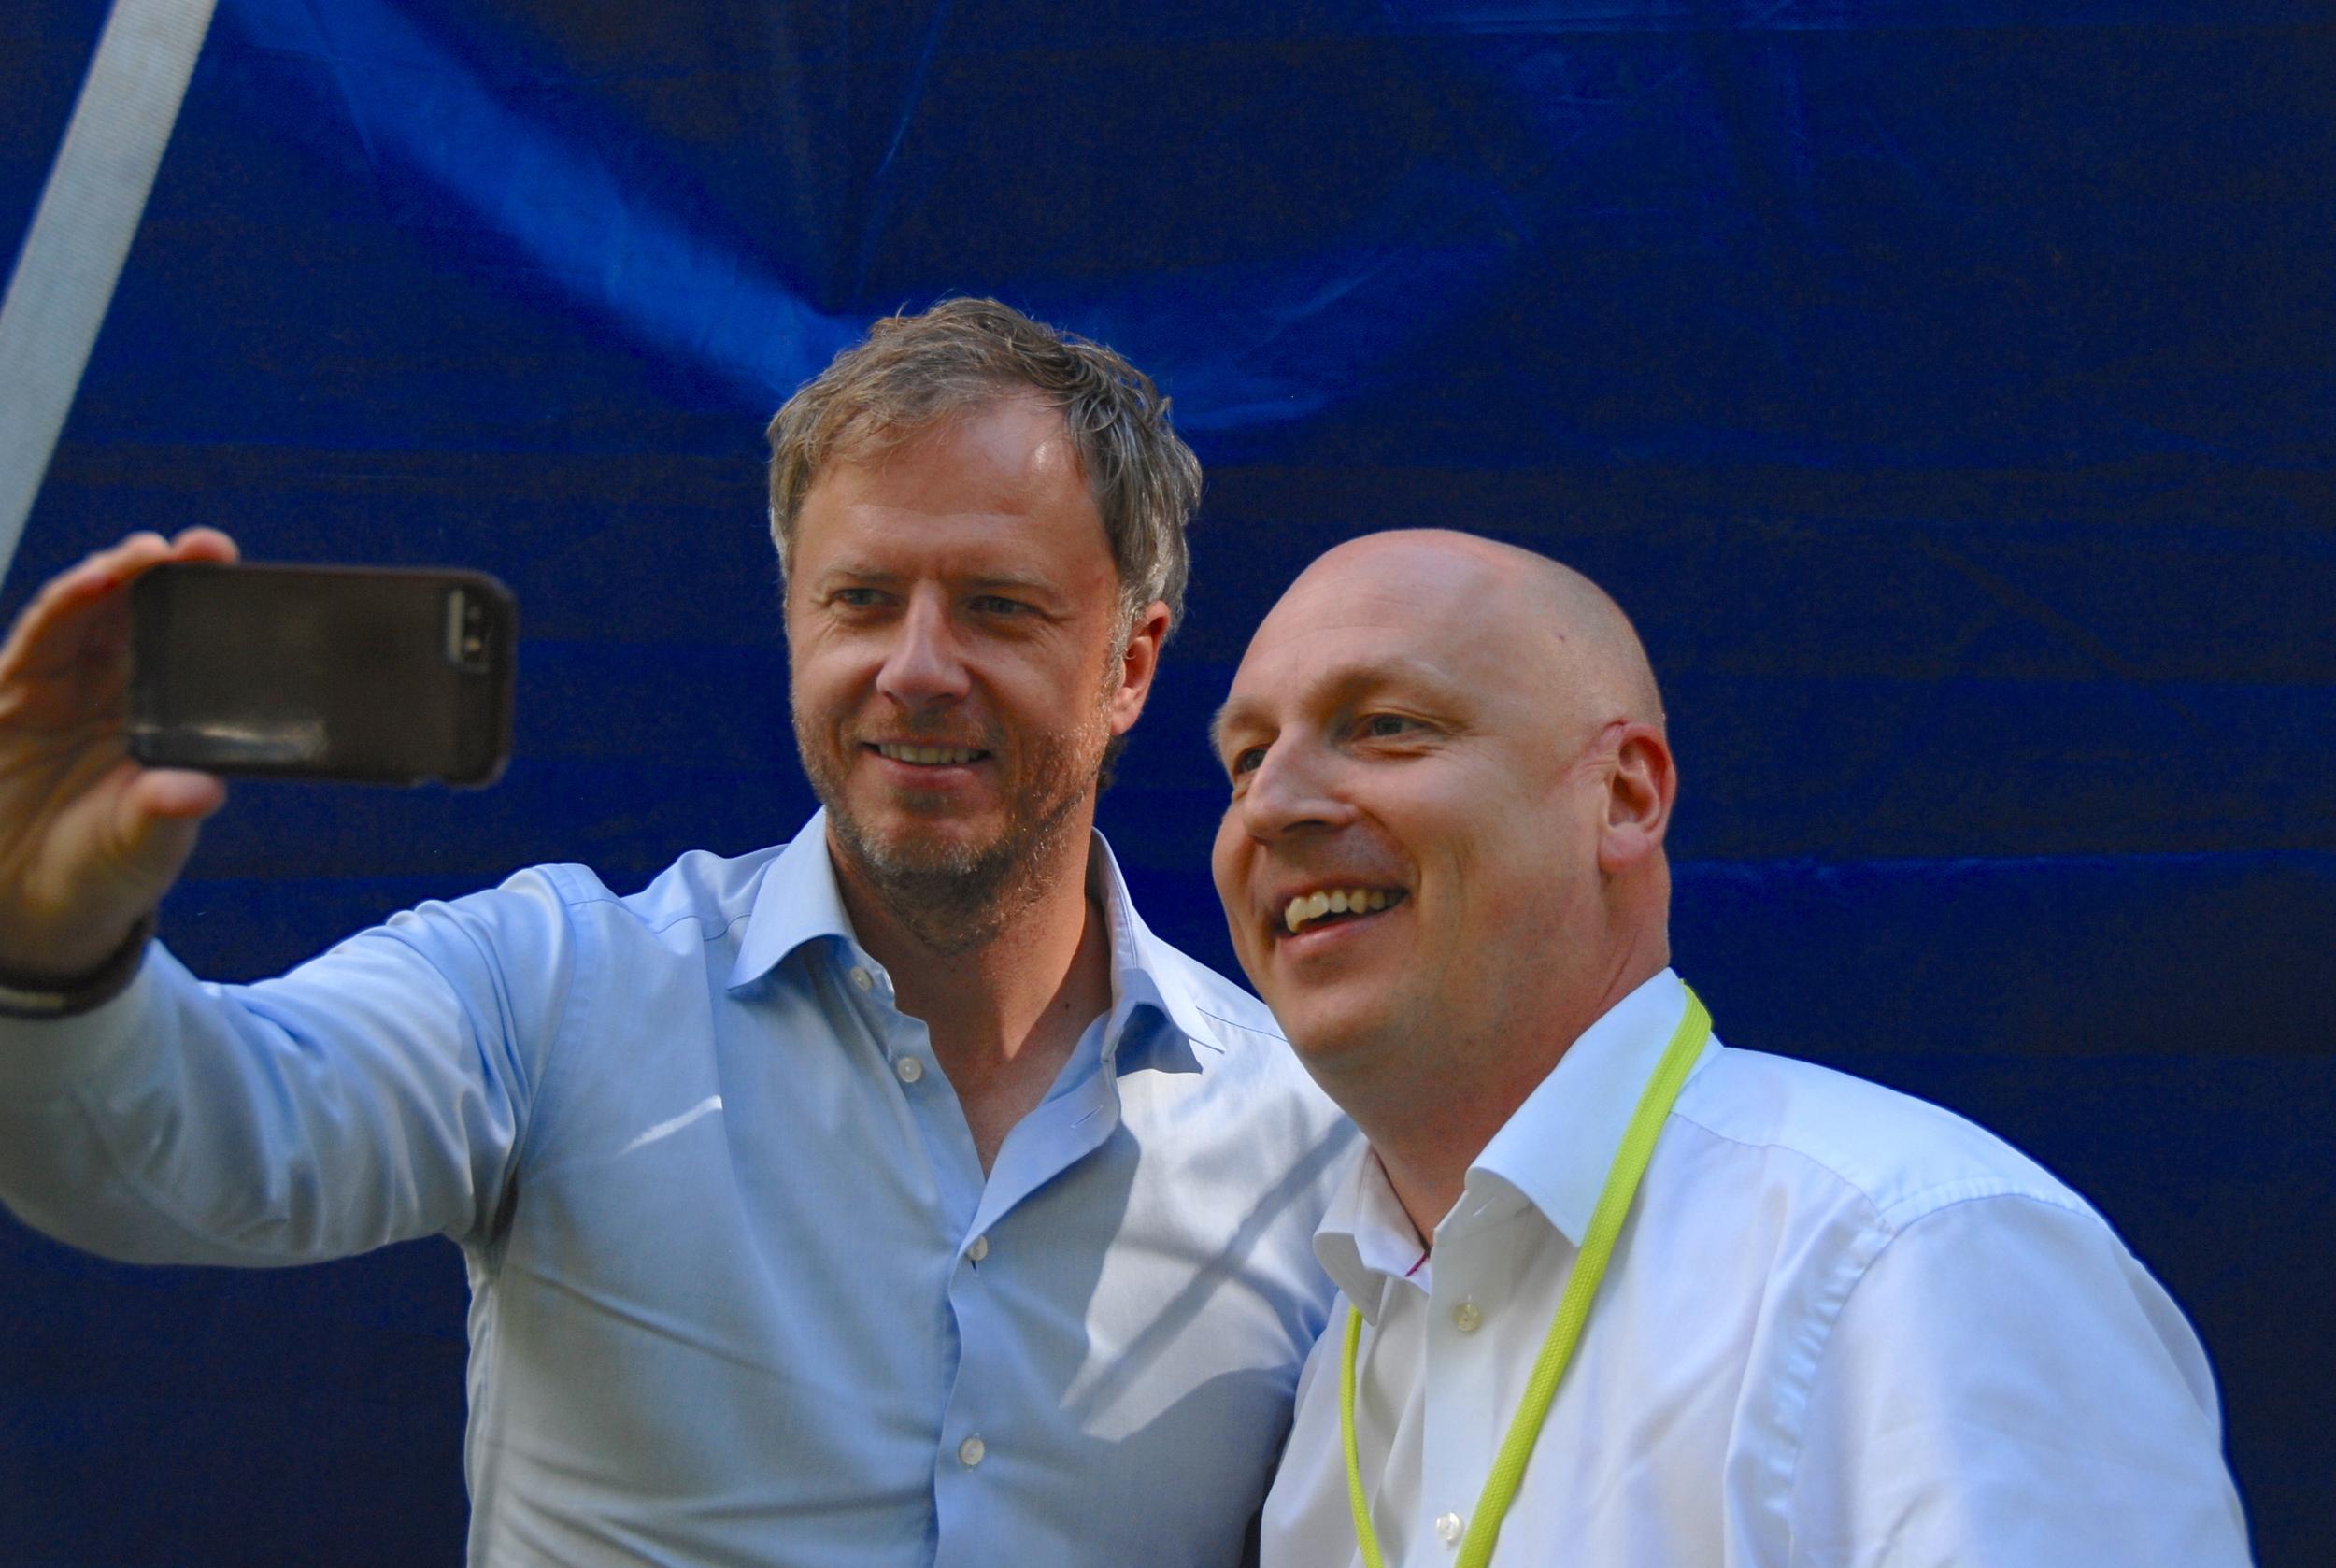 Olof R och Lasse K 1.jpeg